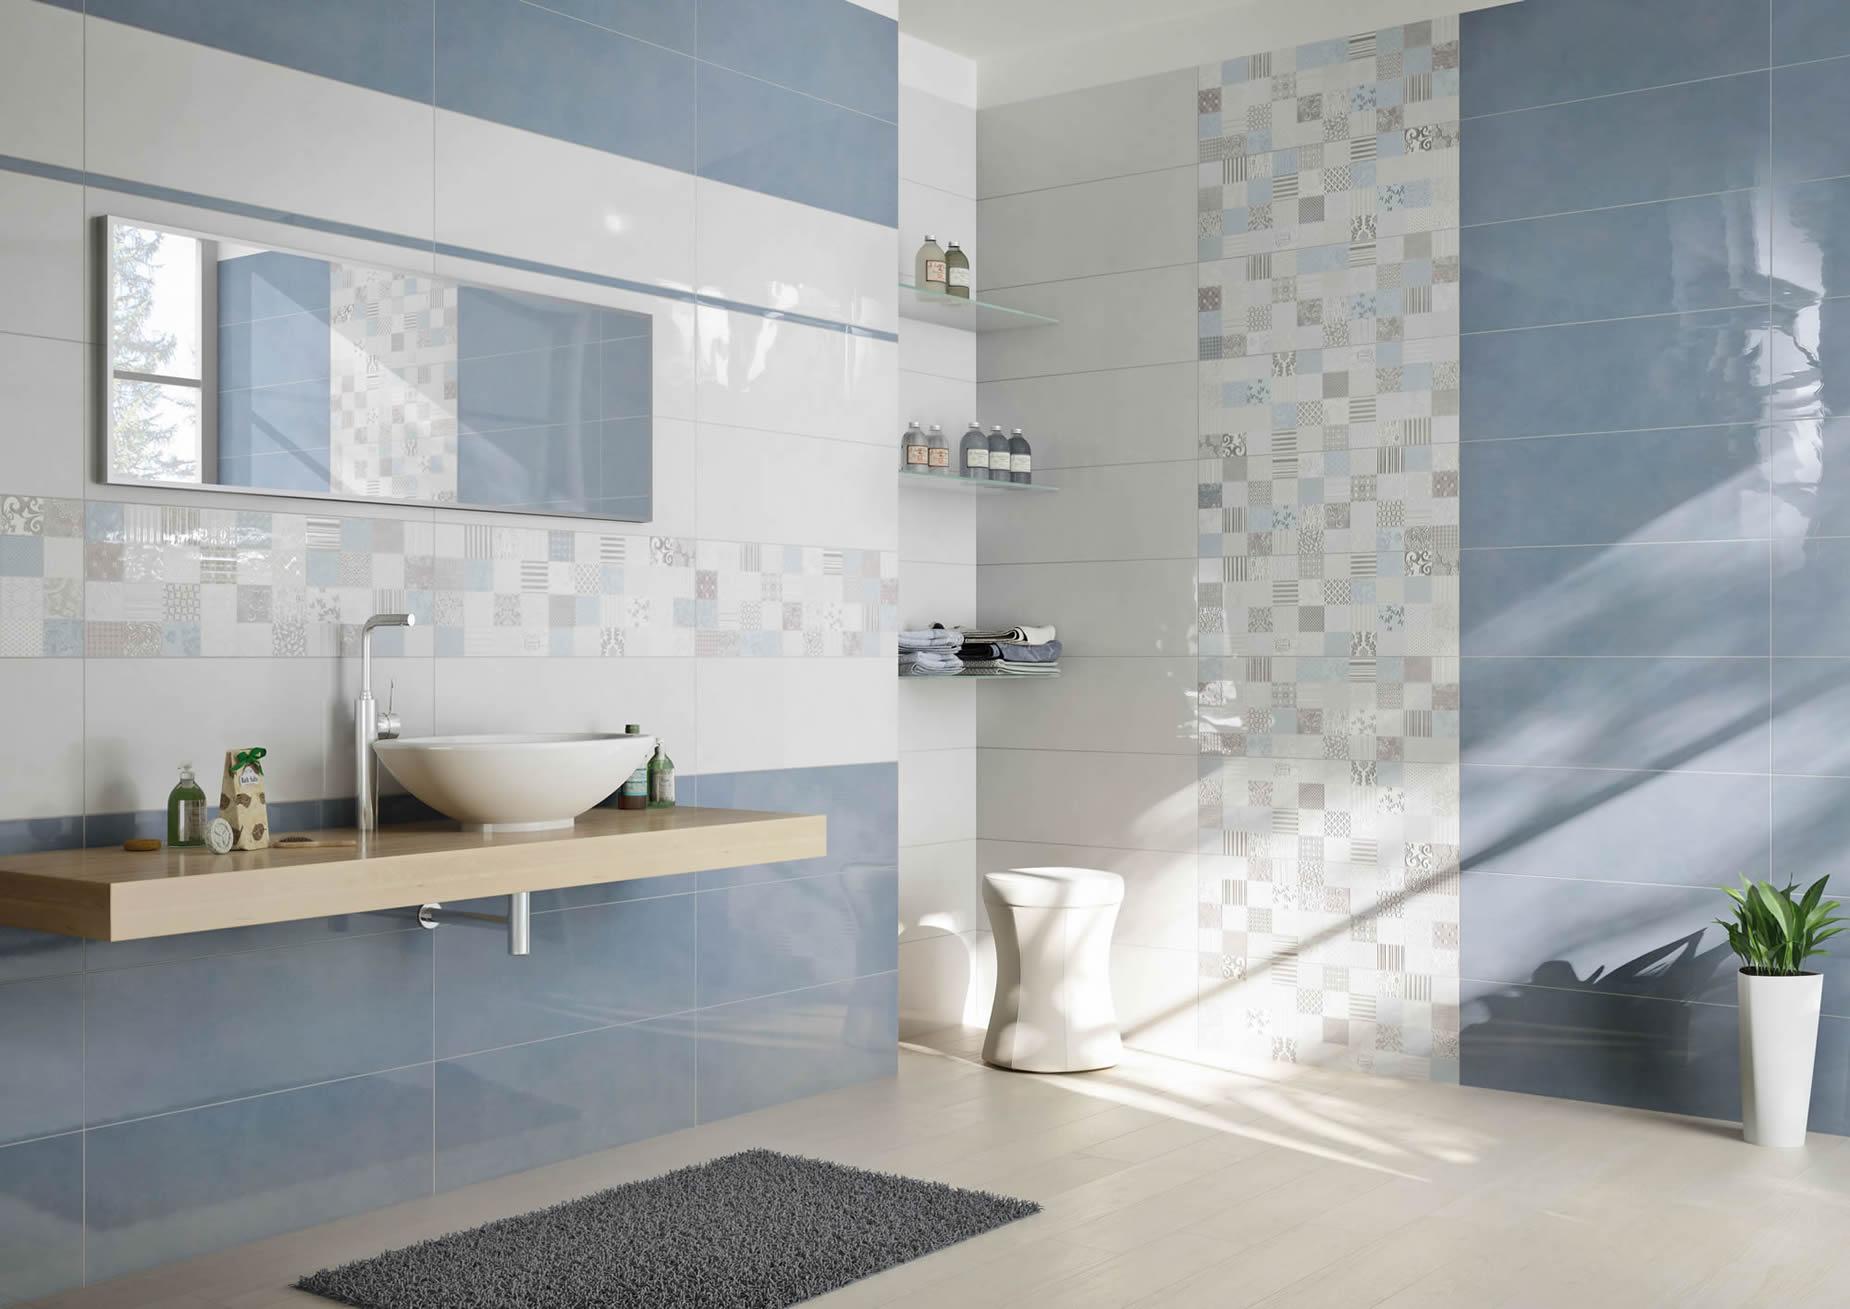 Design Bagno Torino : Design rivestimento bagno bianco celeste donnaweb